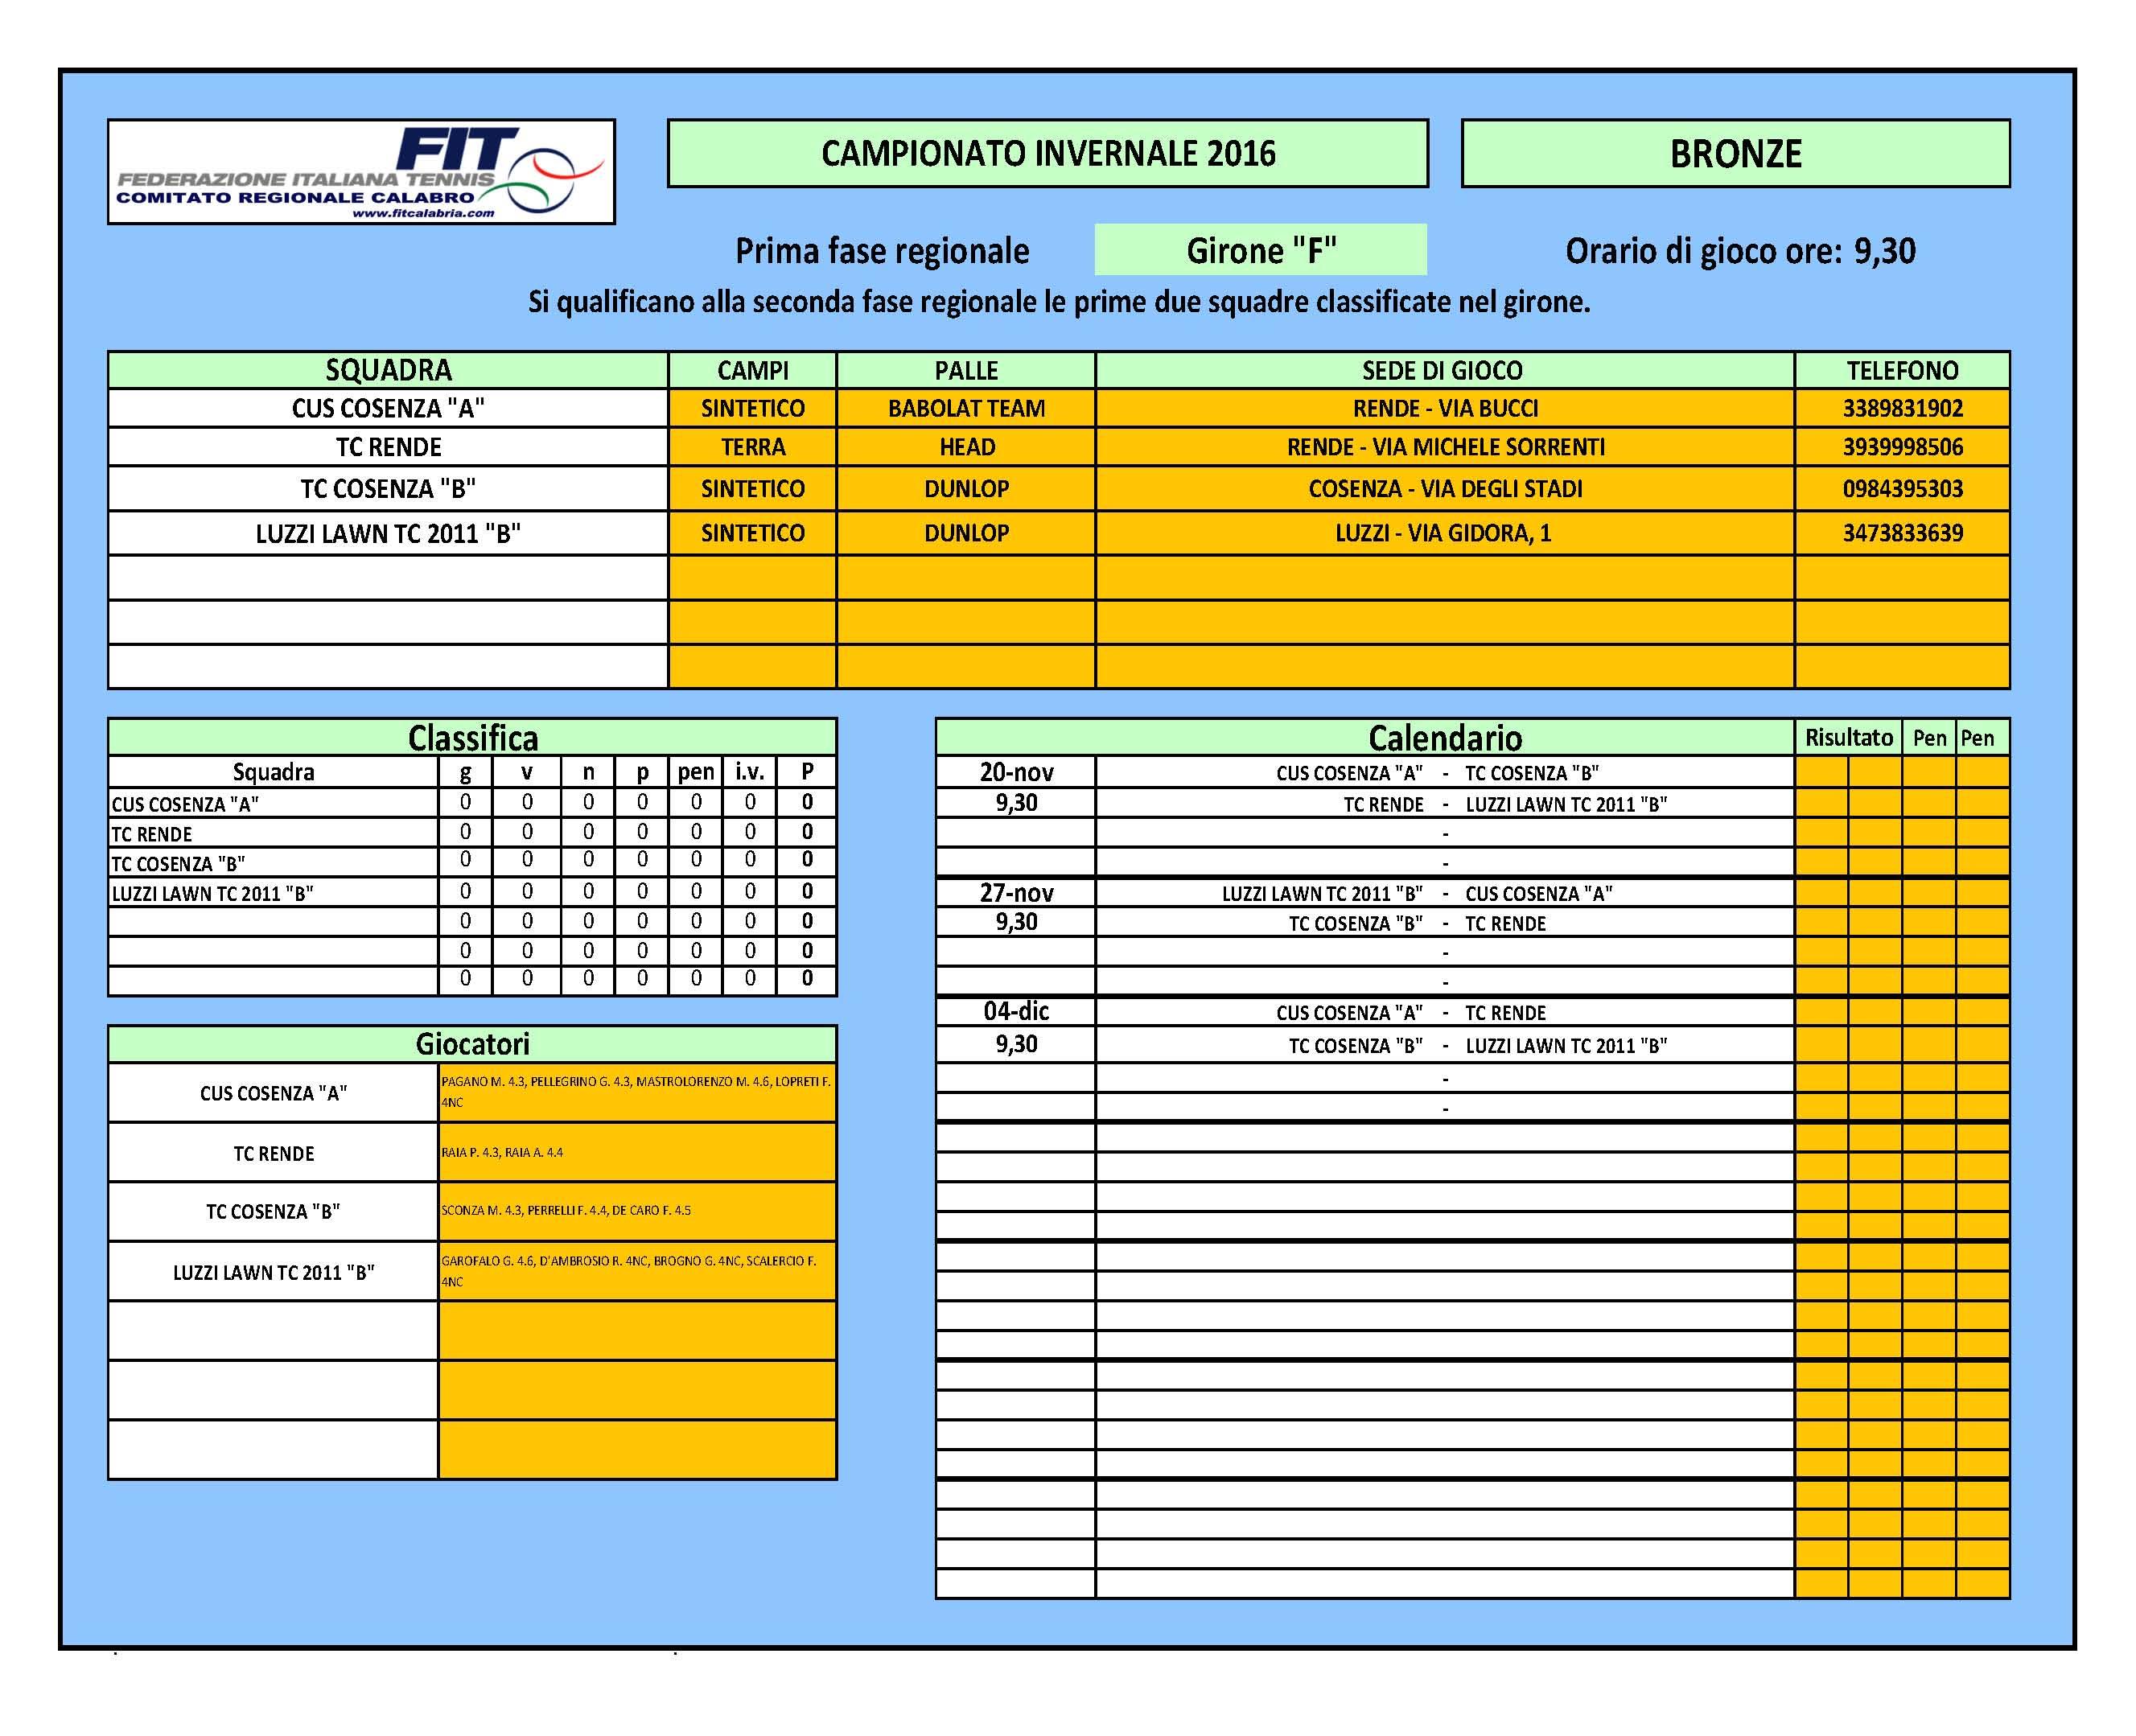 calendario-bronze-m-2016-girone-f